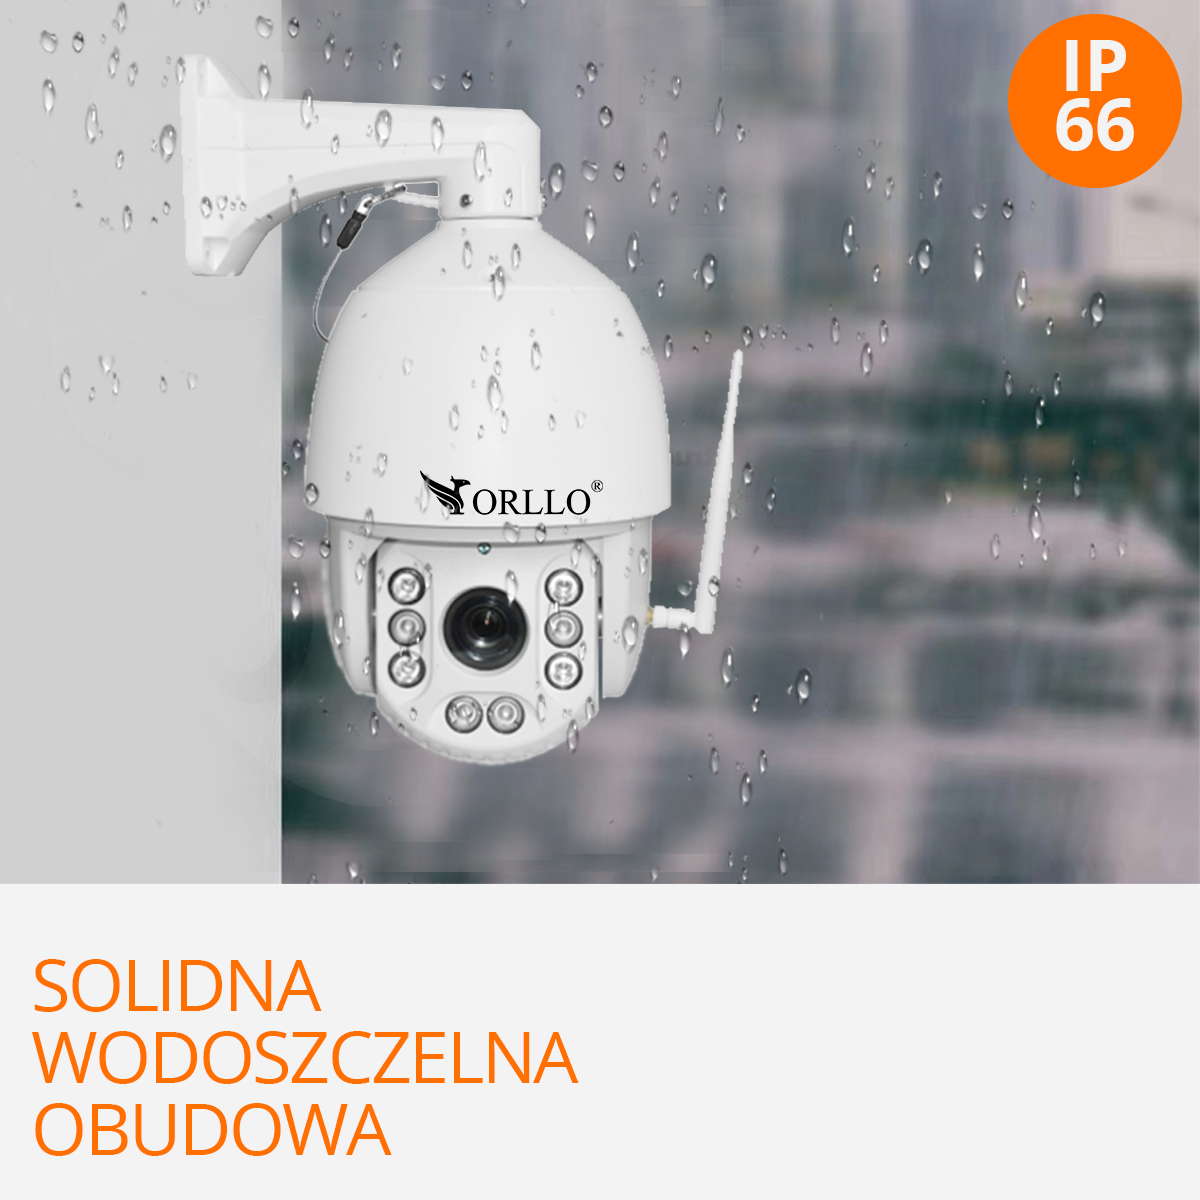 kamera zewnetrzna wewnetrzna wodoodporna ip66 orllo.pl